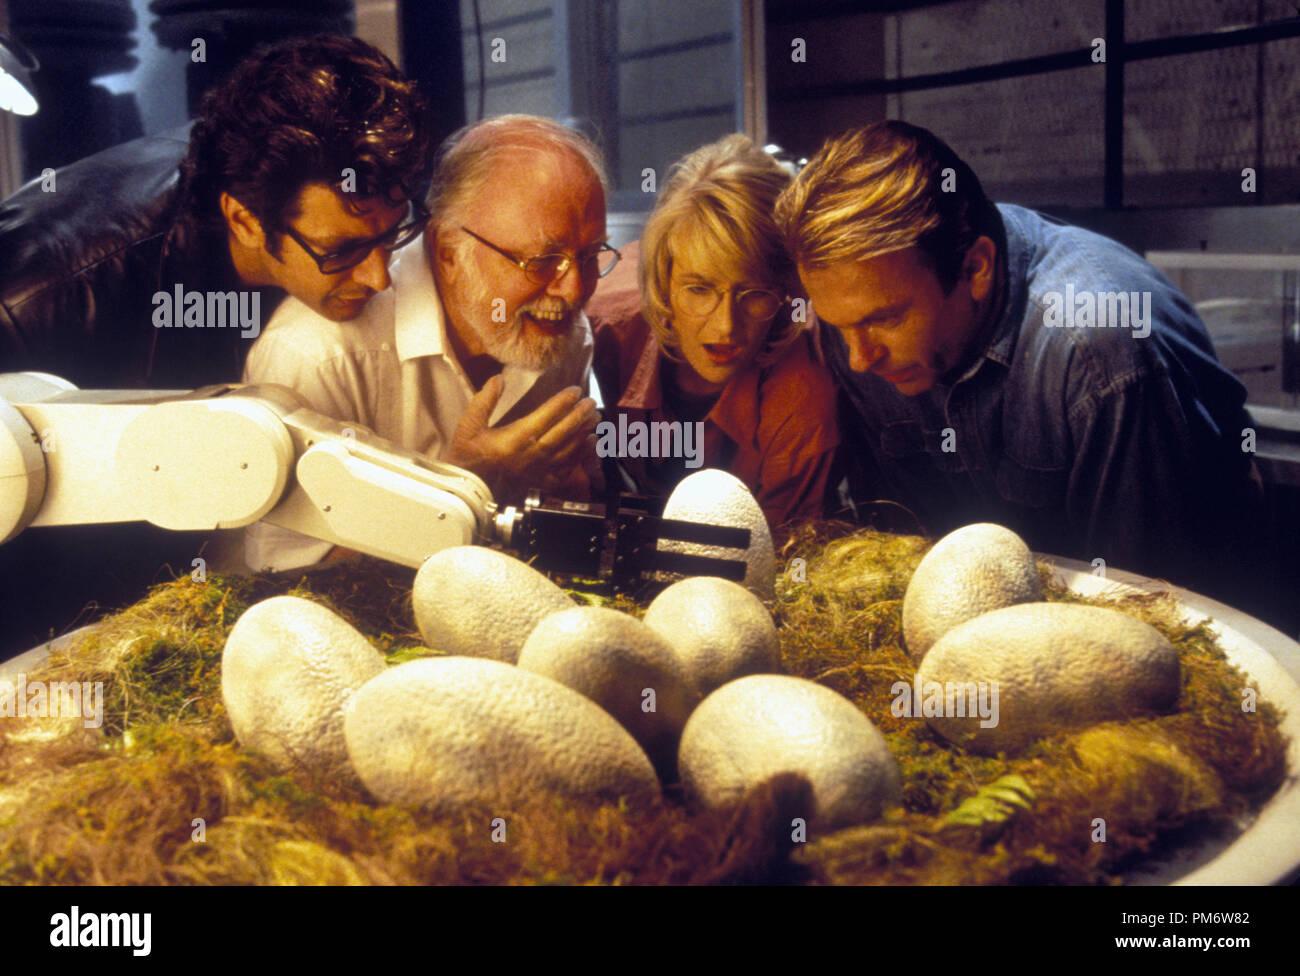 Film Still from 'Jurassic Park' Jeff Goldblum, Richard Attenborough, Laura Dern, Sam Neill © 1993 Universal Photo Credit: Murray Close - Stock Image